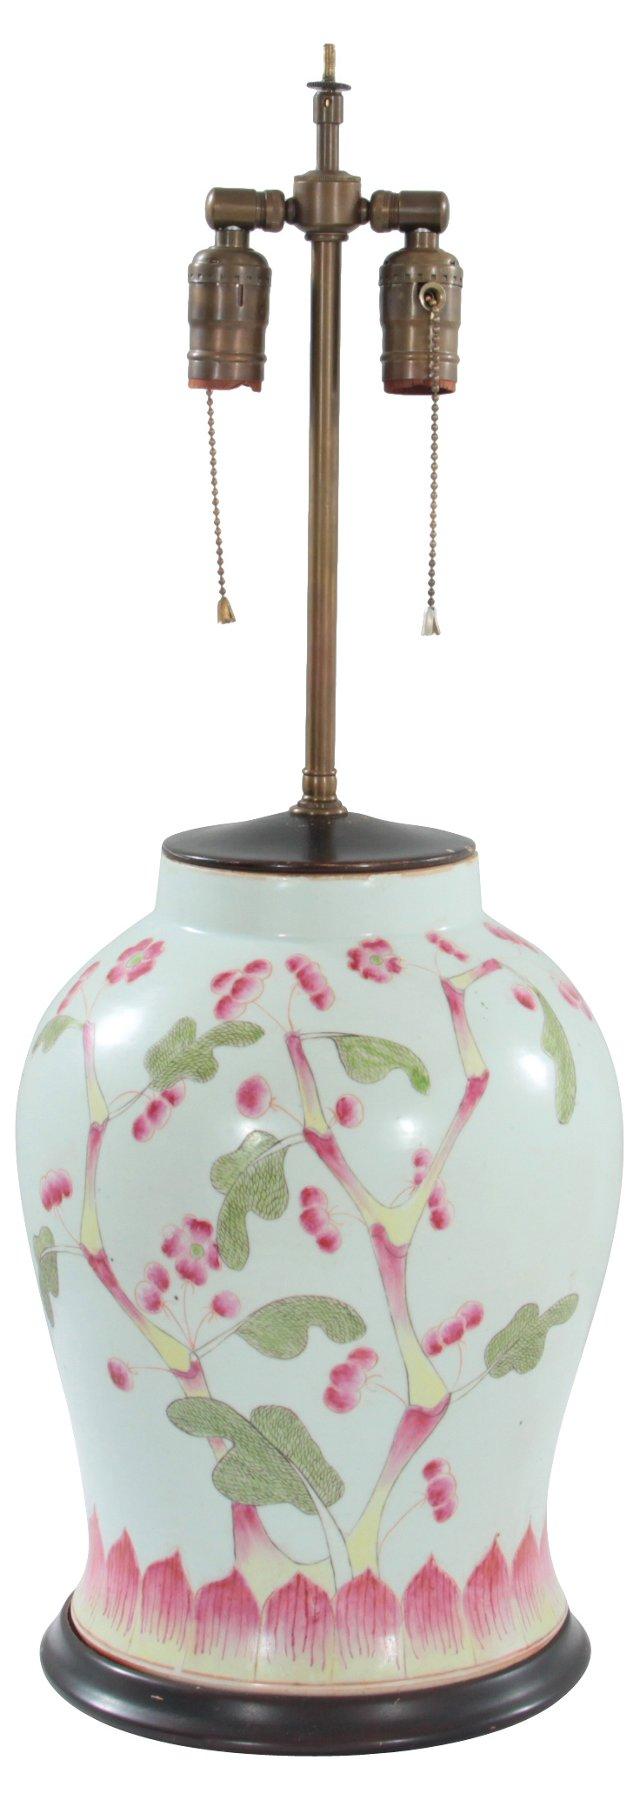 19thC Chinese Export Porcelain Vase Lamp